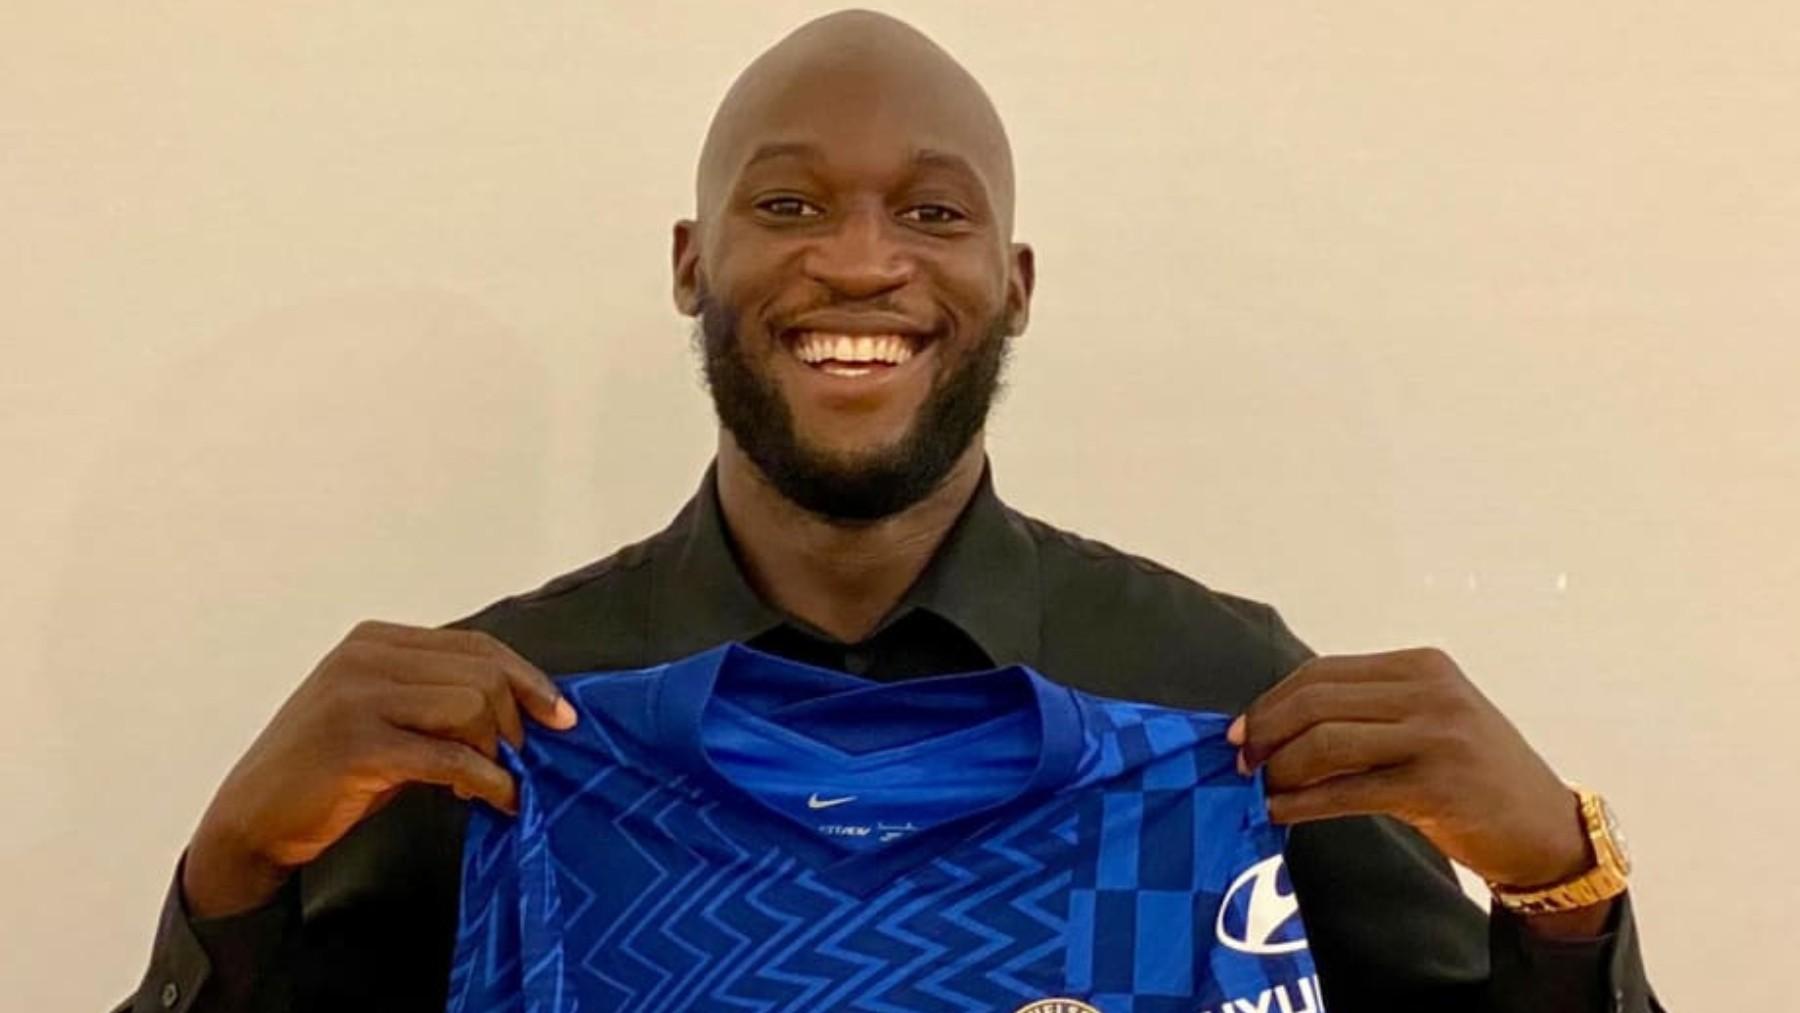 Romelu Lukaku posa con la camiseta del Chelsea. (chelseafc)